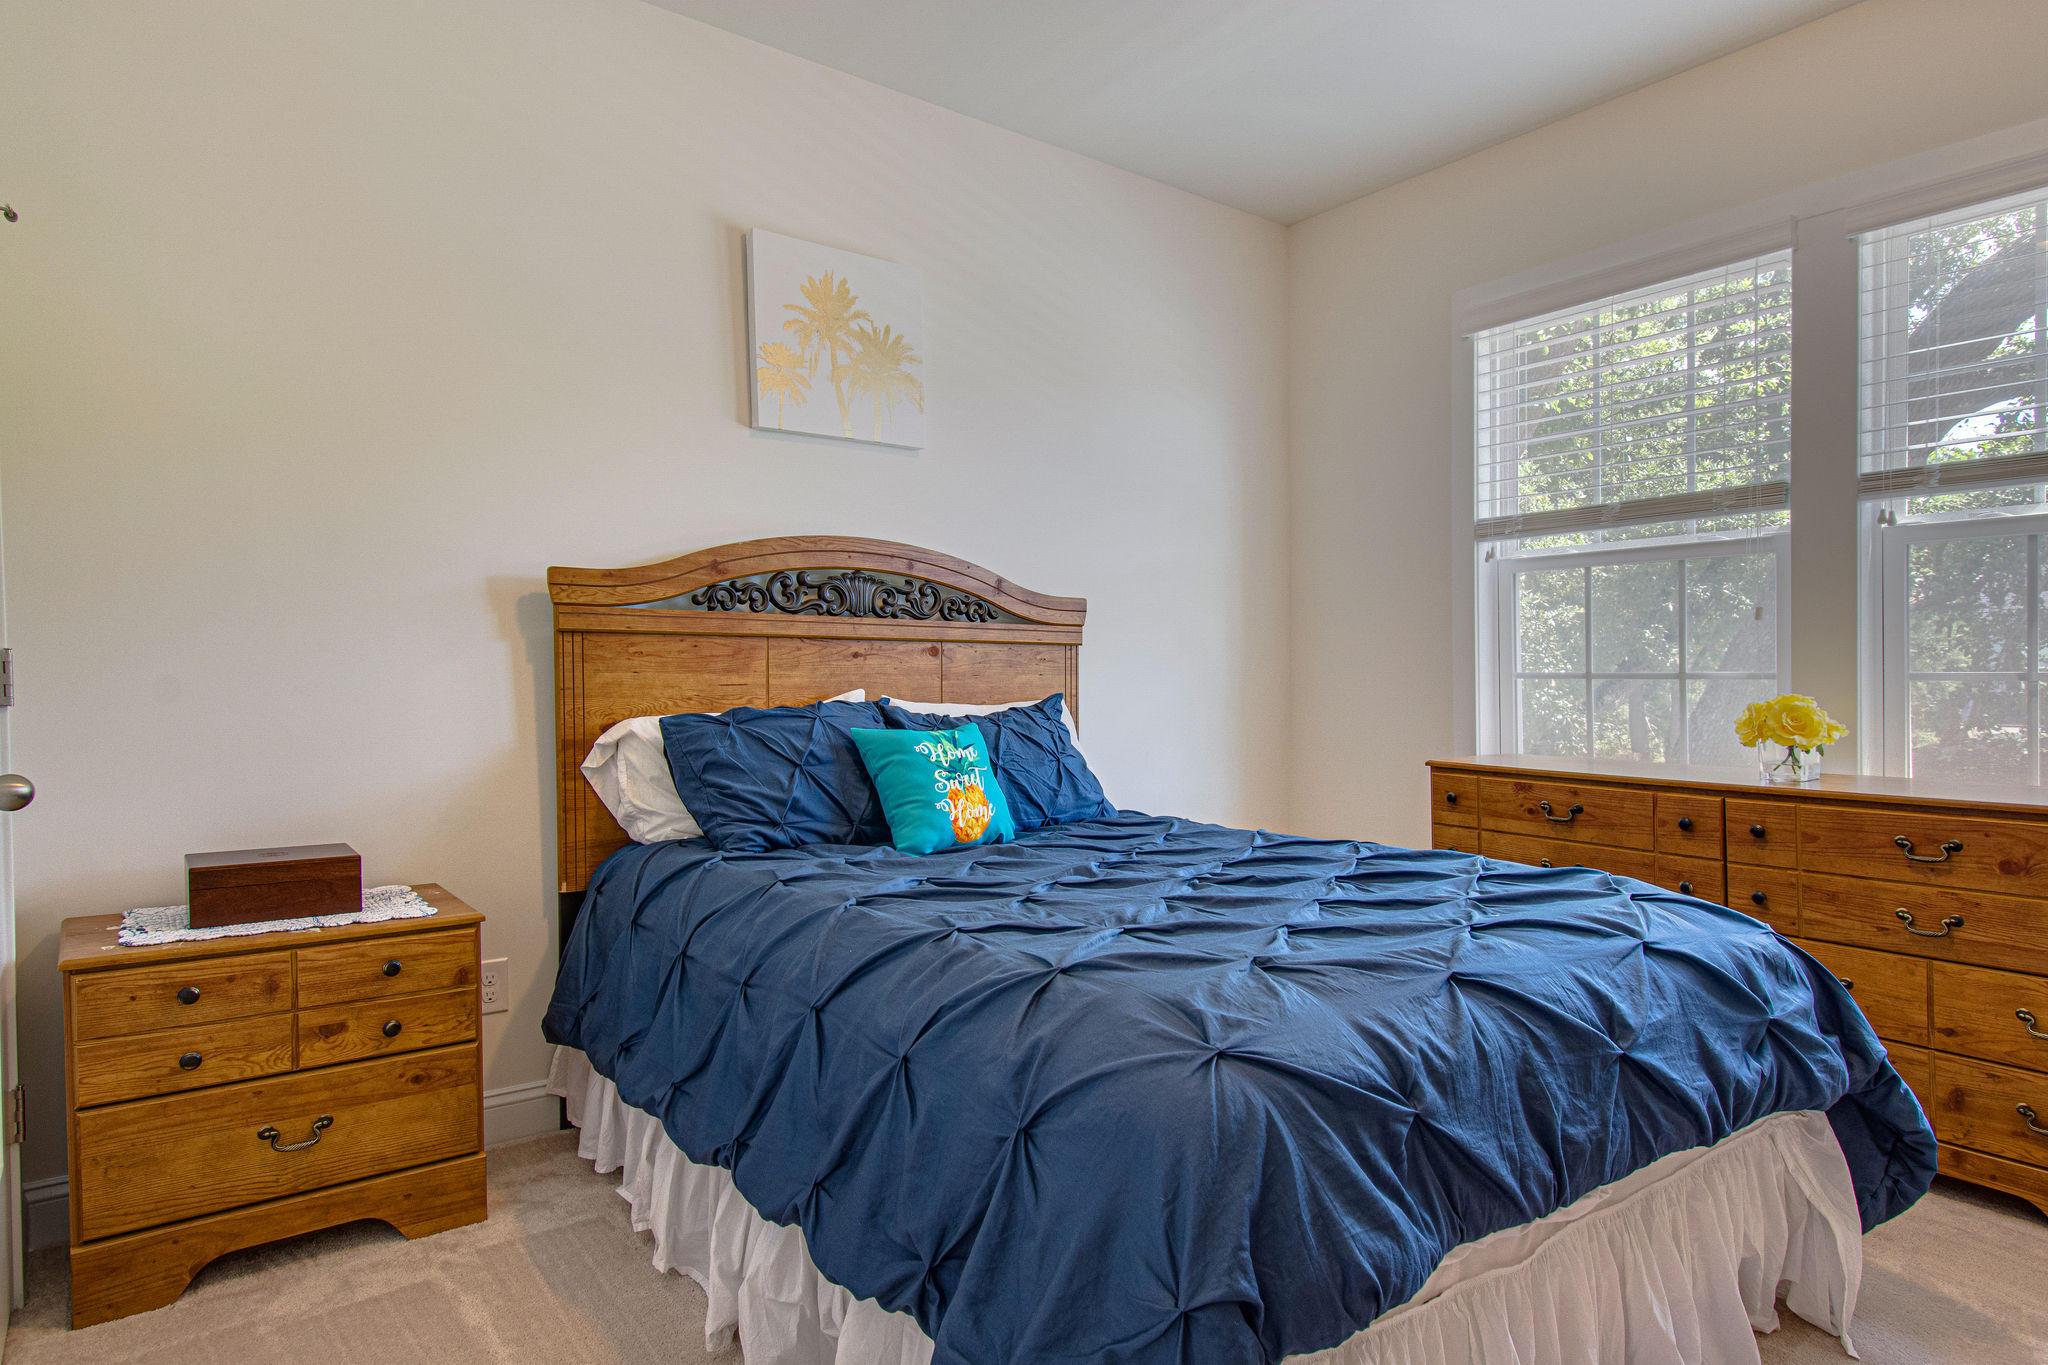 Magnolia Village Homes For Sale - 1261 Pearwood, Mount Pleasant, SC - 19